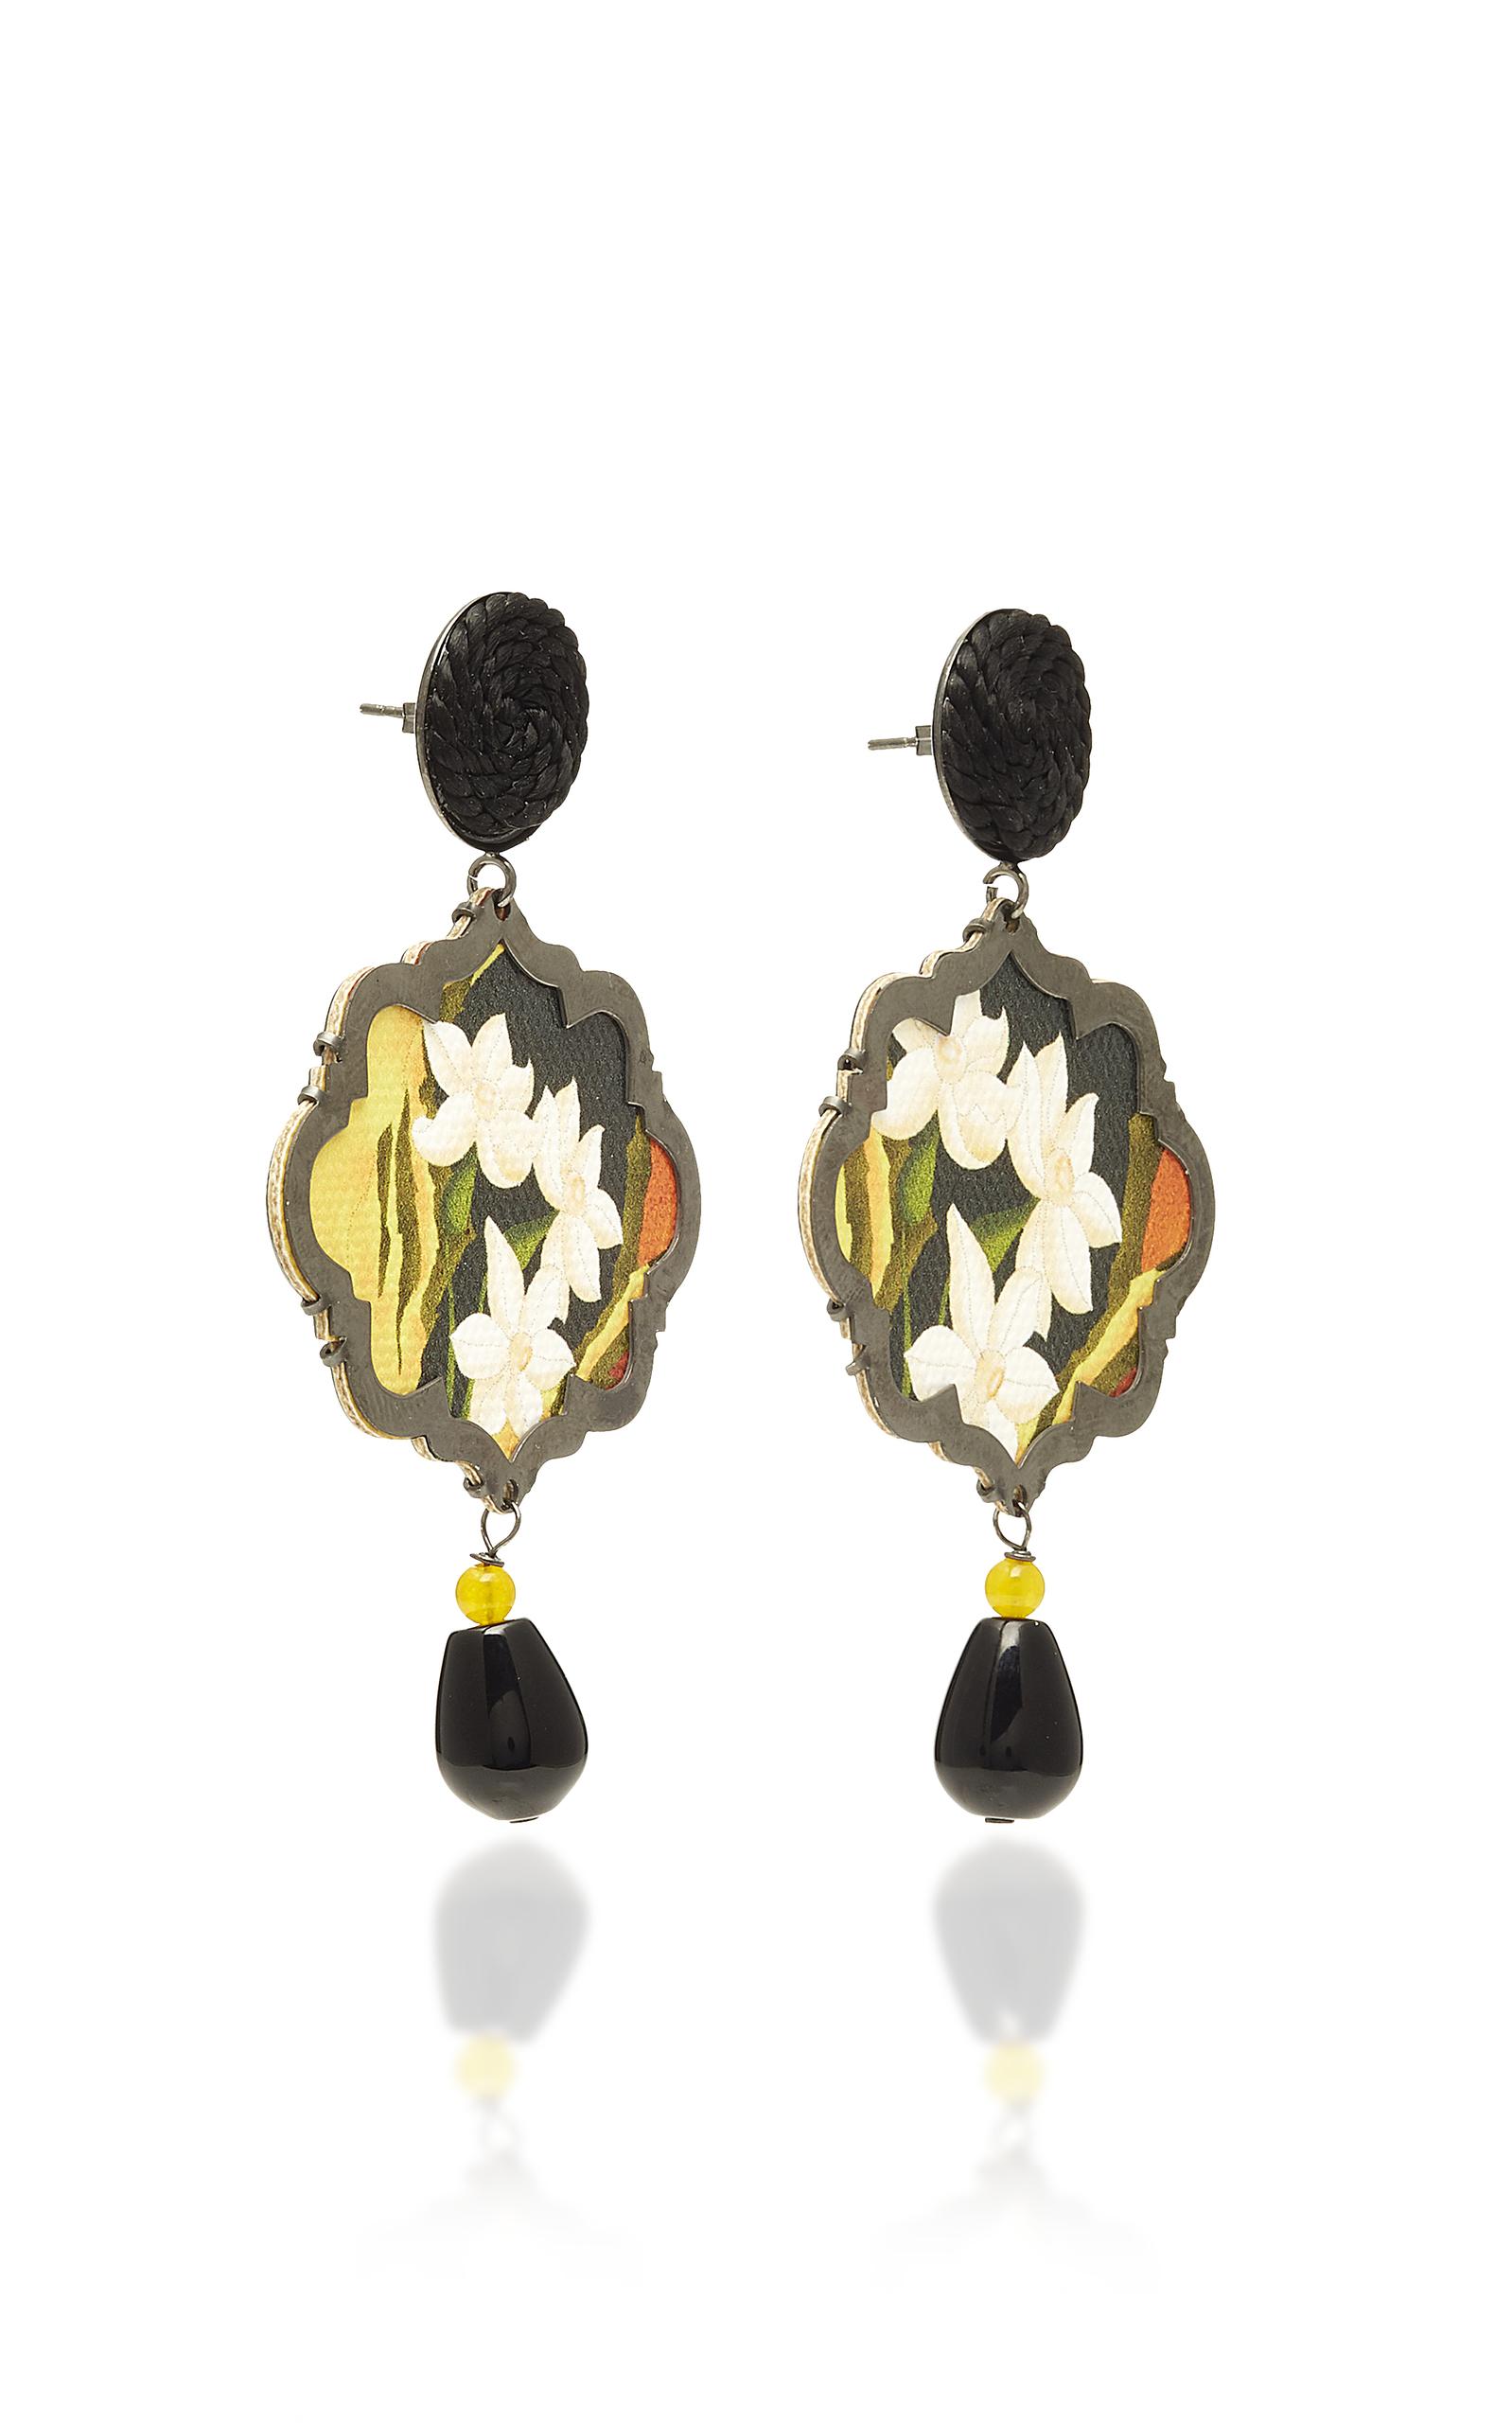 Marco Polo Lotus Flower Earrings By Anna E Alex Moda Operandi